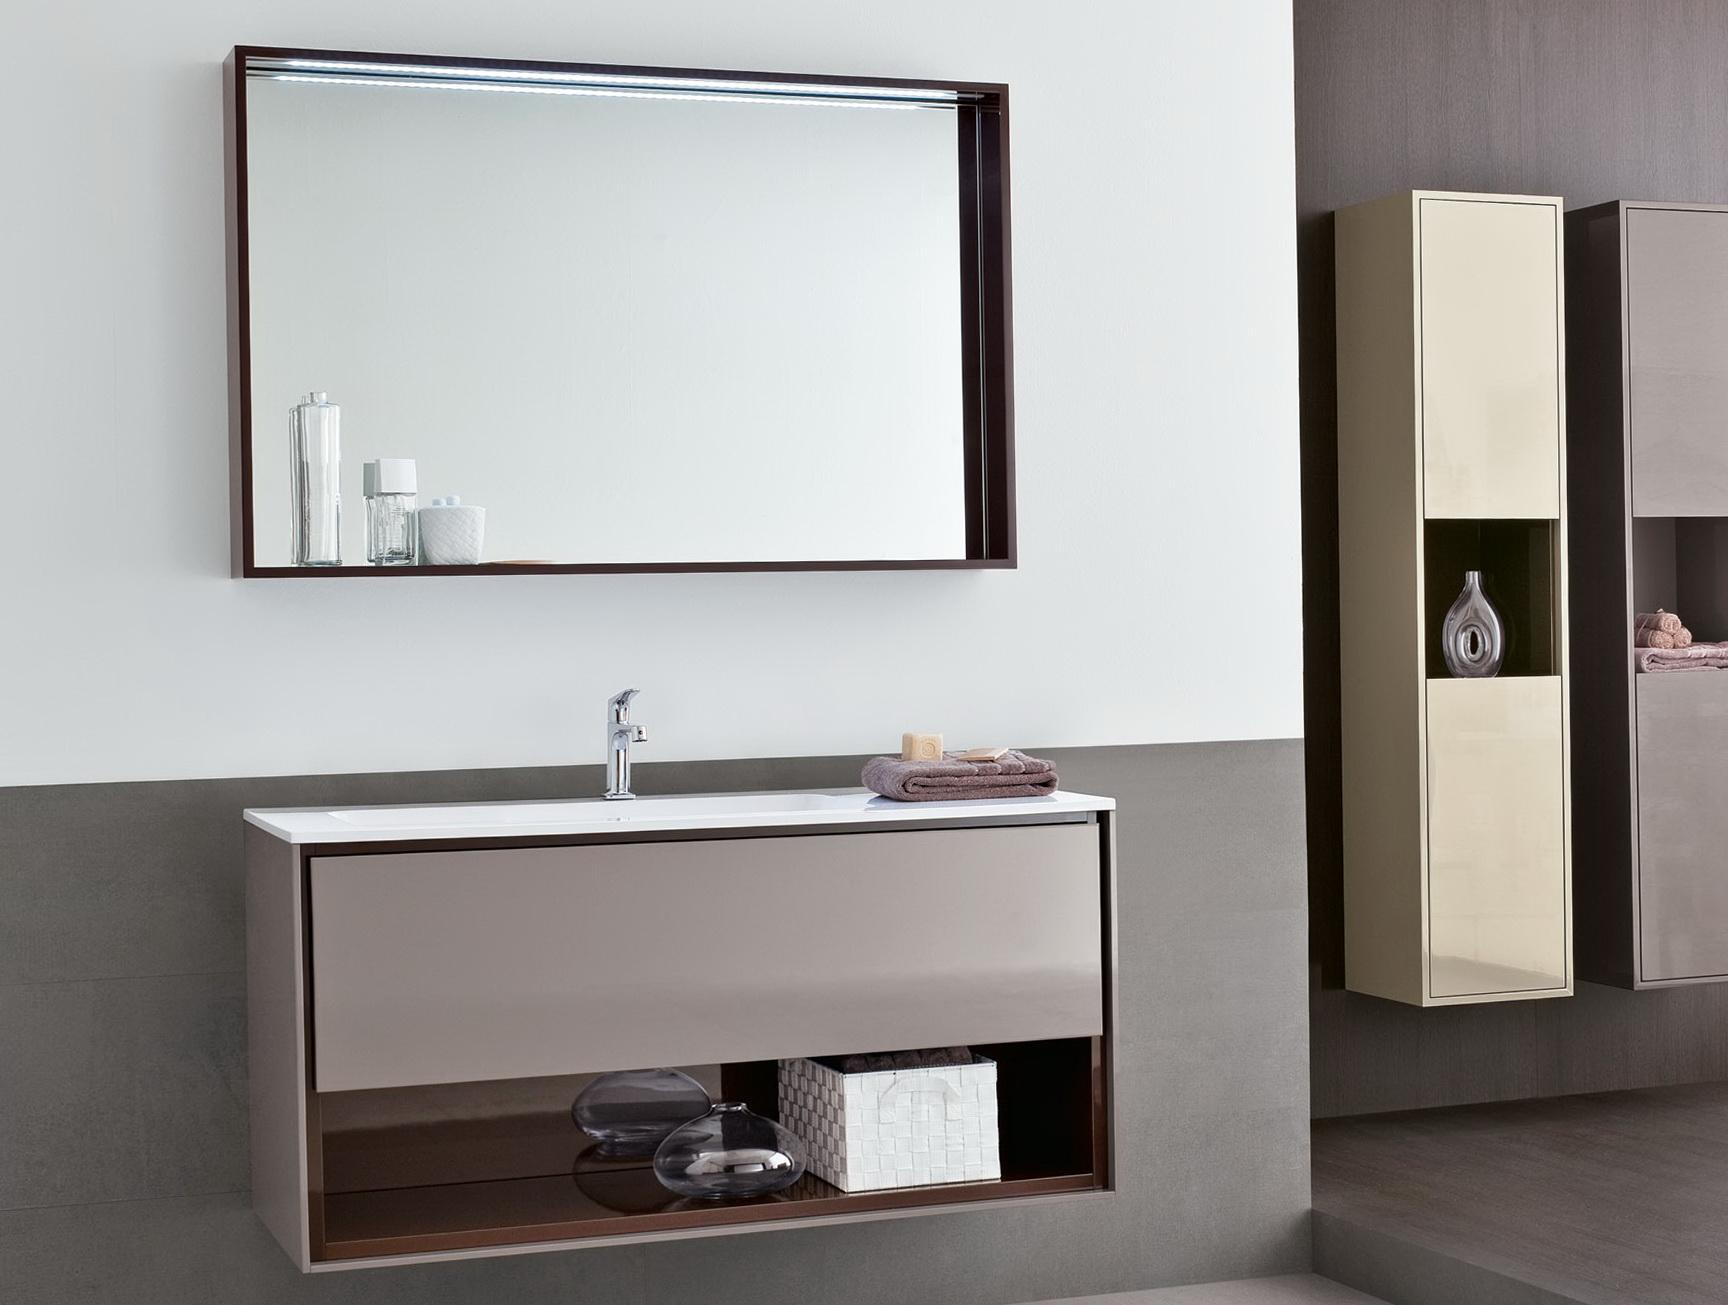 Large Bathroom Mirror With Storage